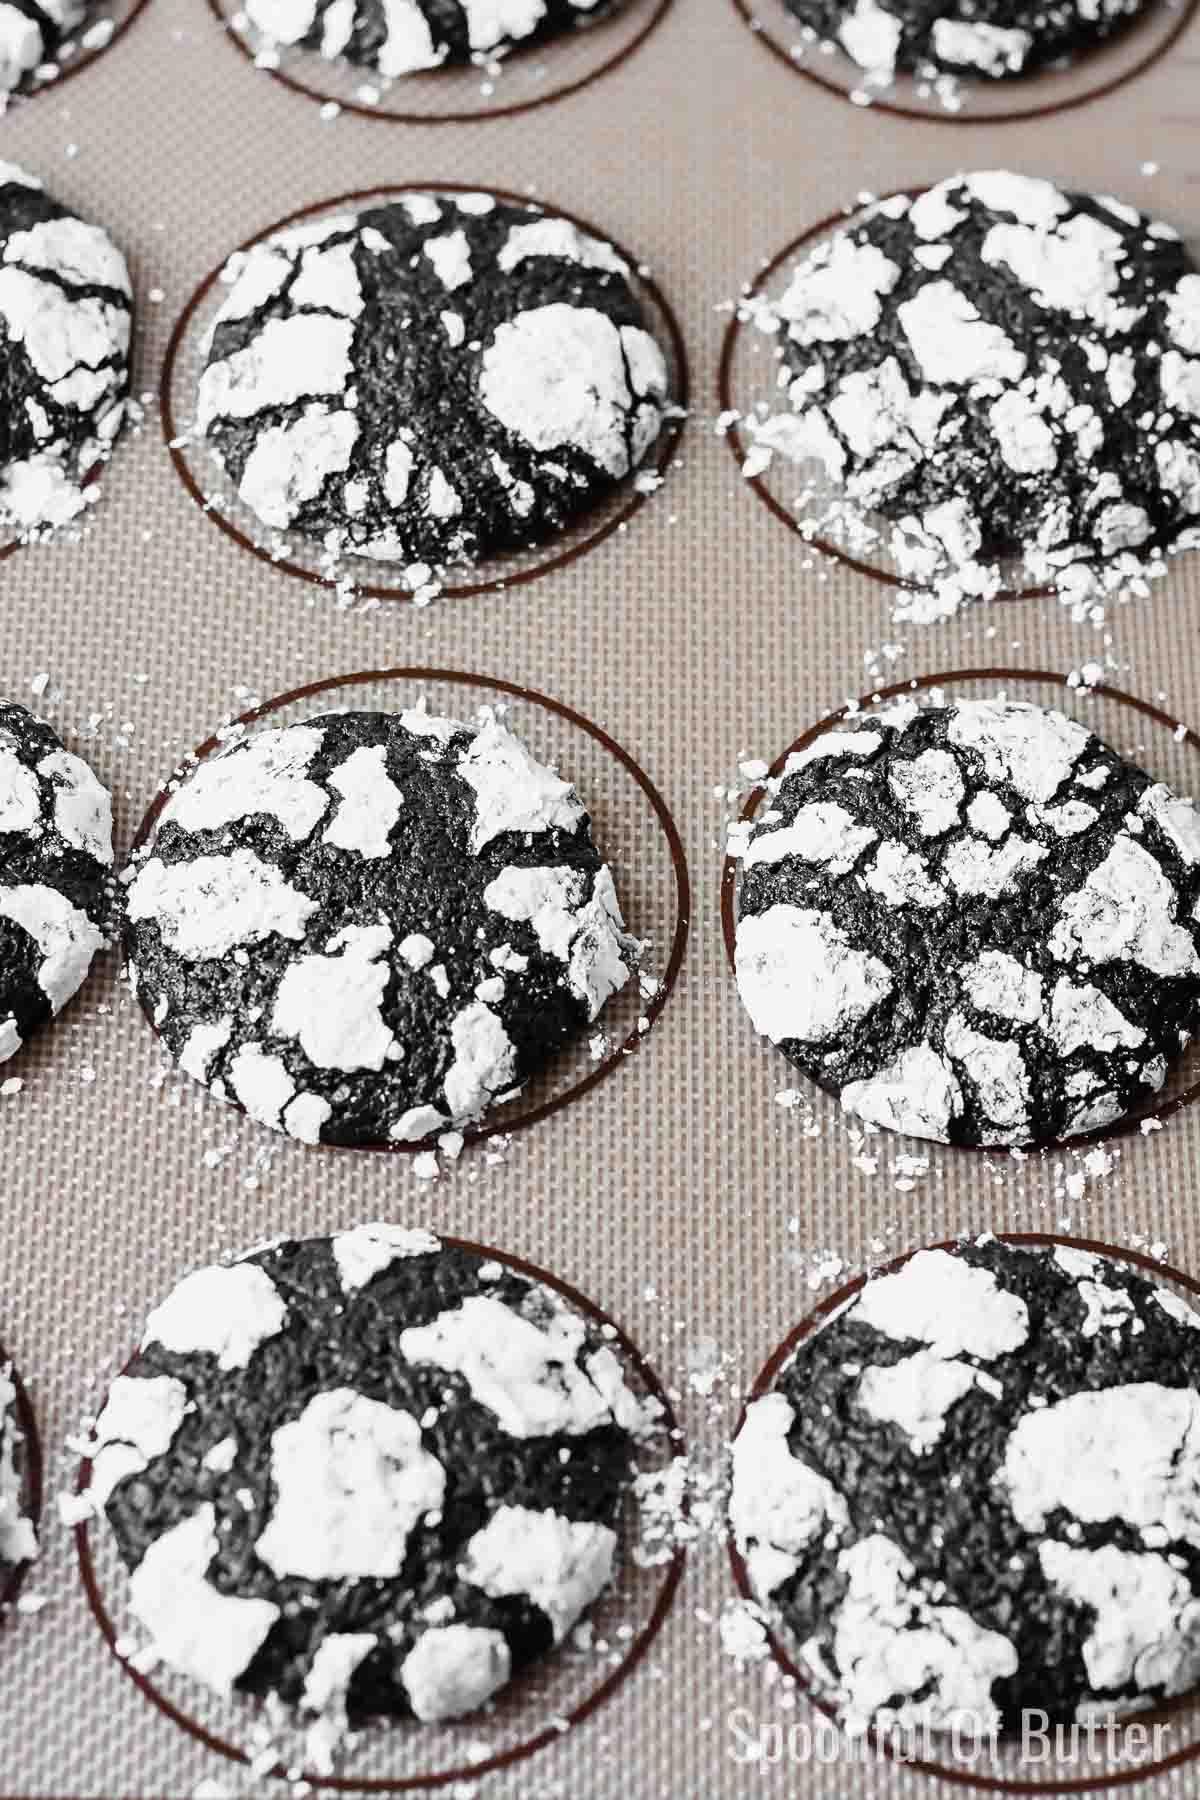 Black Cocoa Cookies on baking sheet